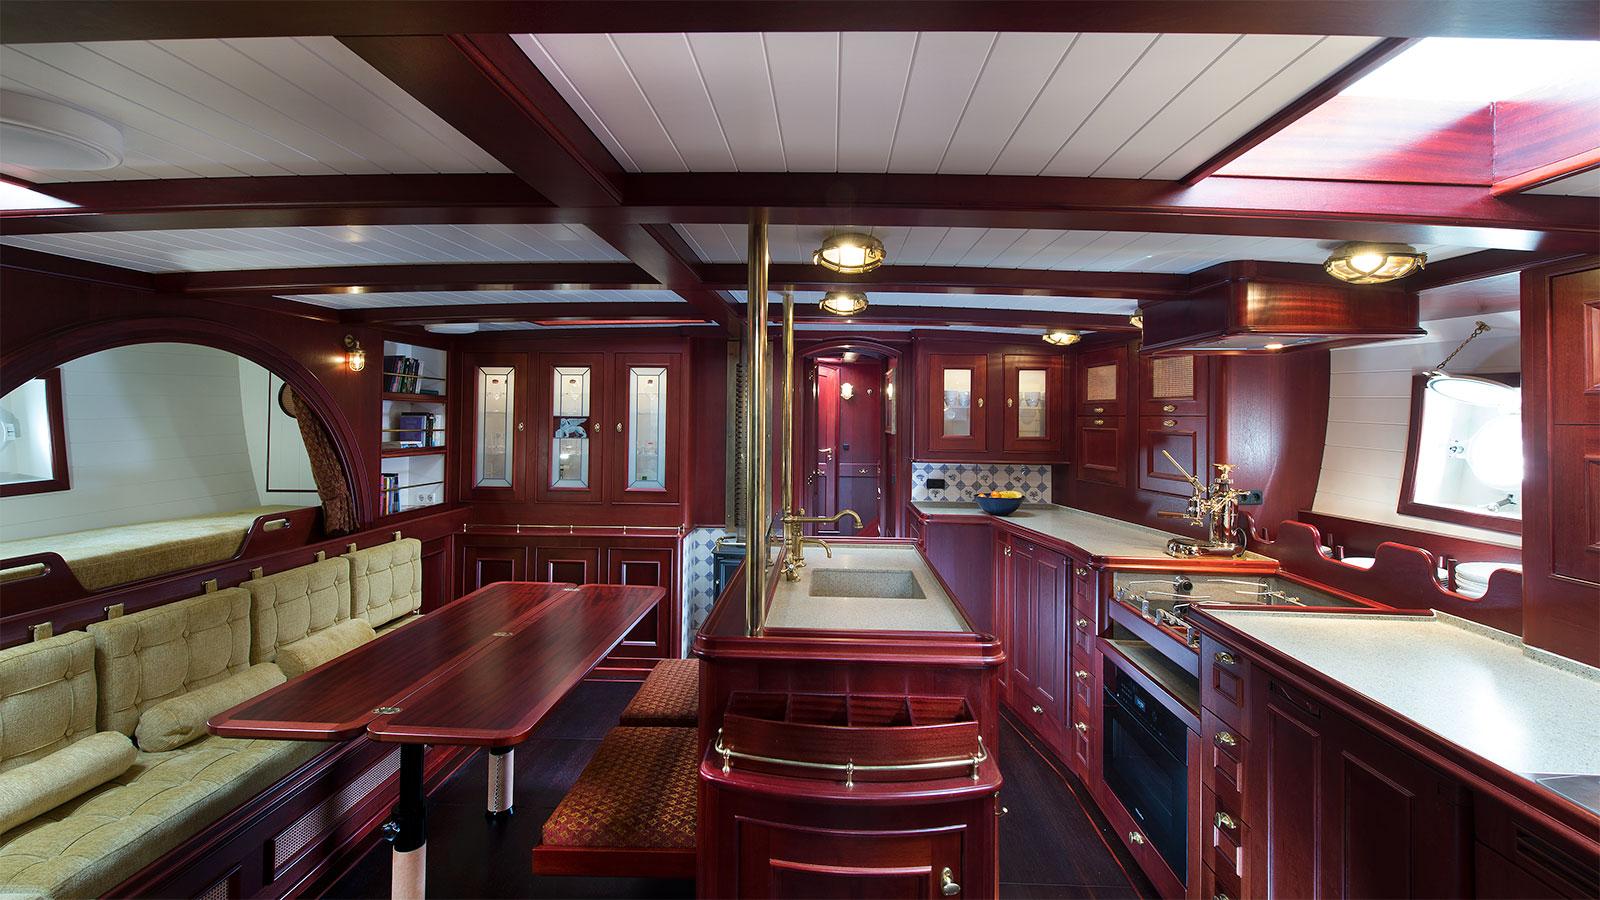 the-saloon-of-the-gaff-rigged-sailing-superyacht-spirit-of-venice-credit-olivier-van-meer-vmg-yachtbuilders